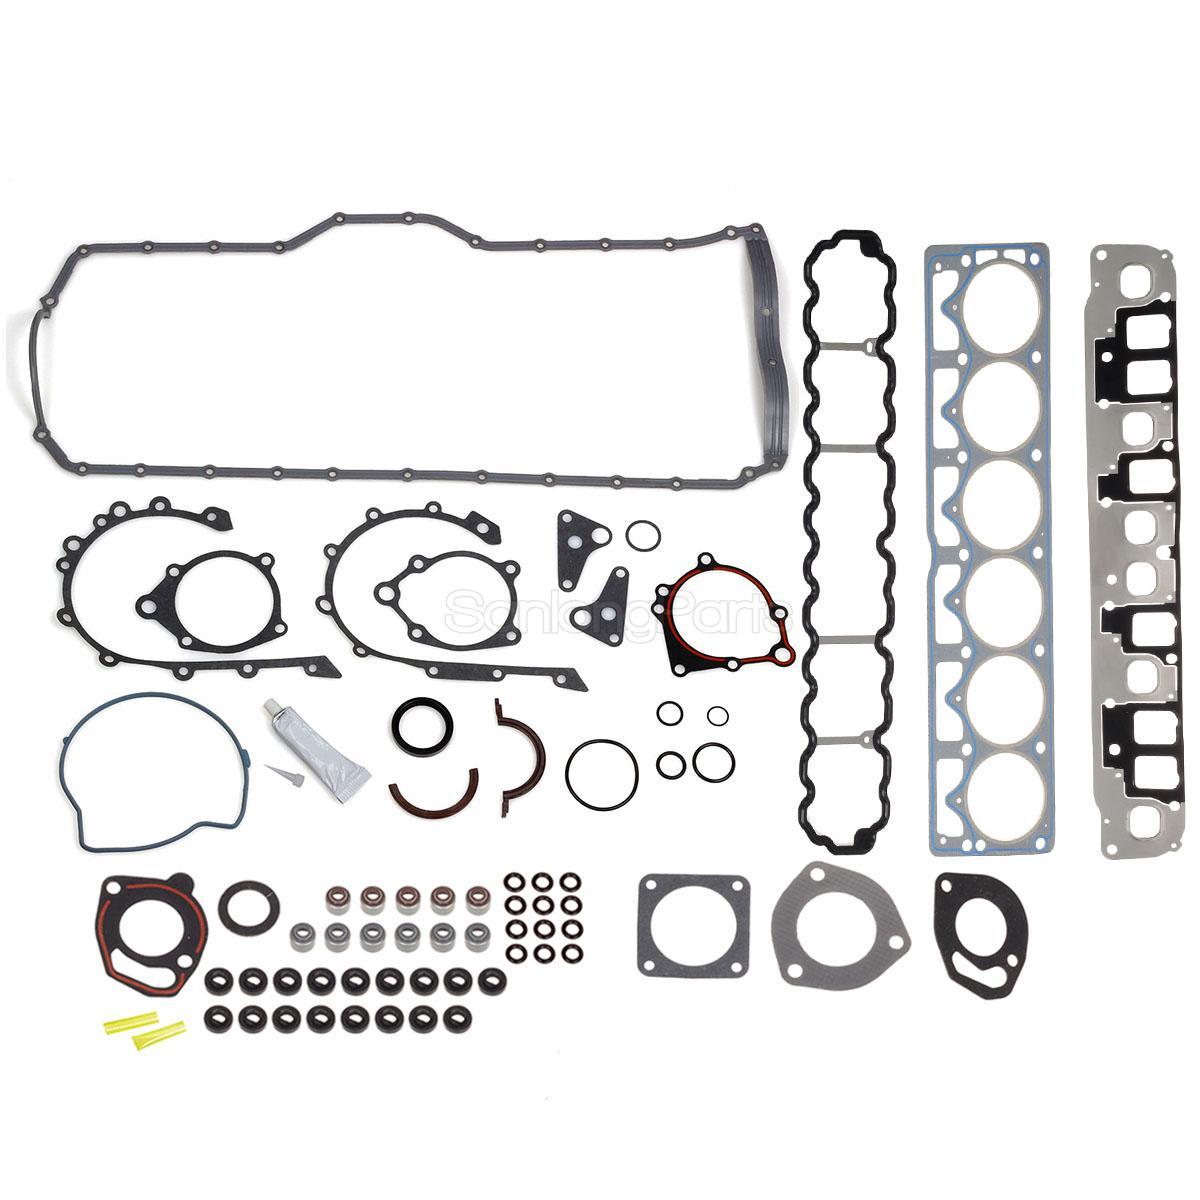 Full Gasket Kits for Jeep Grand Cherokee Comanche Wrangler